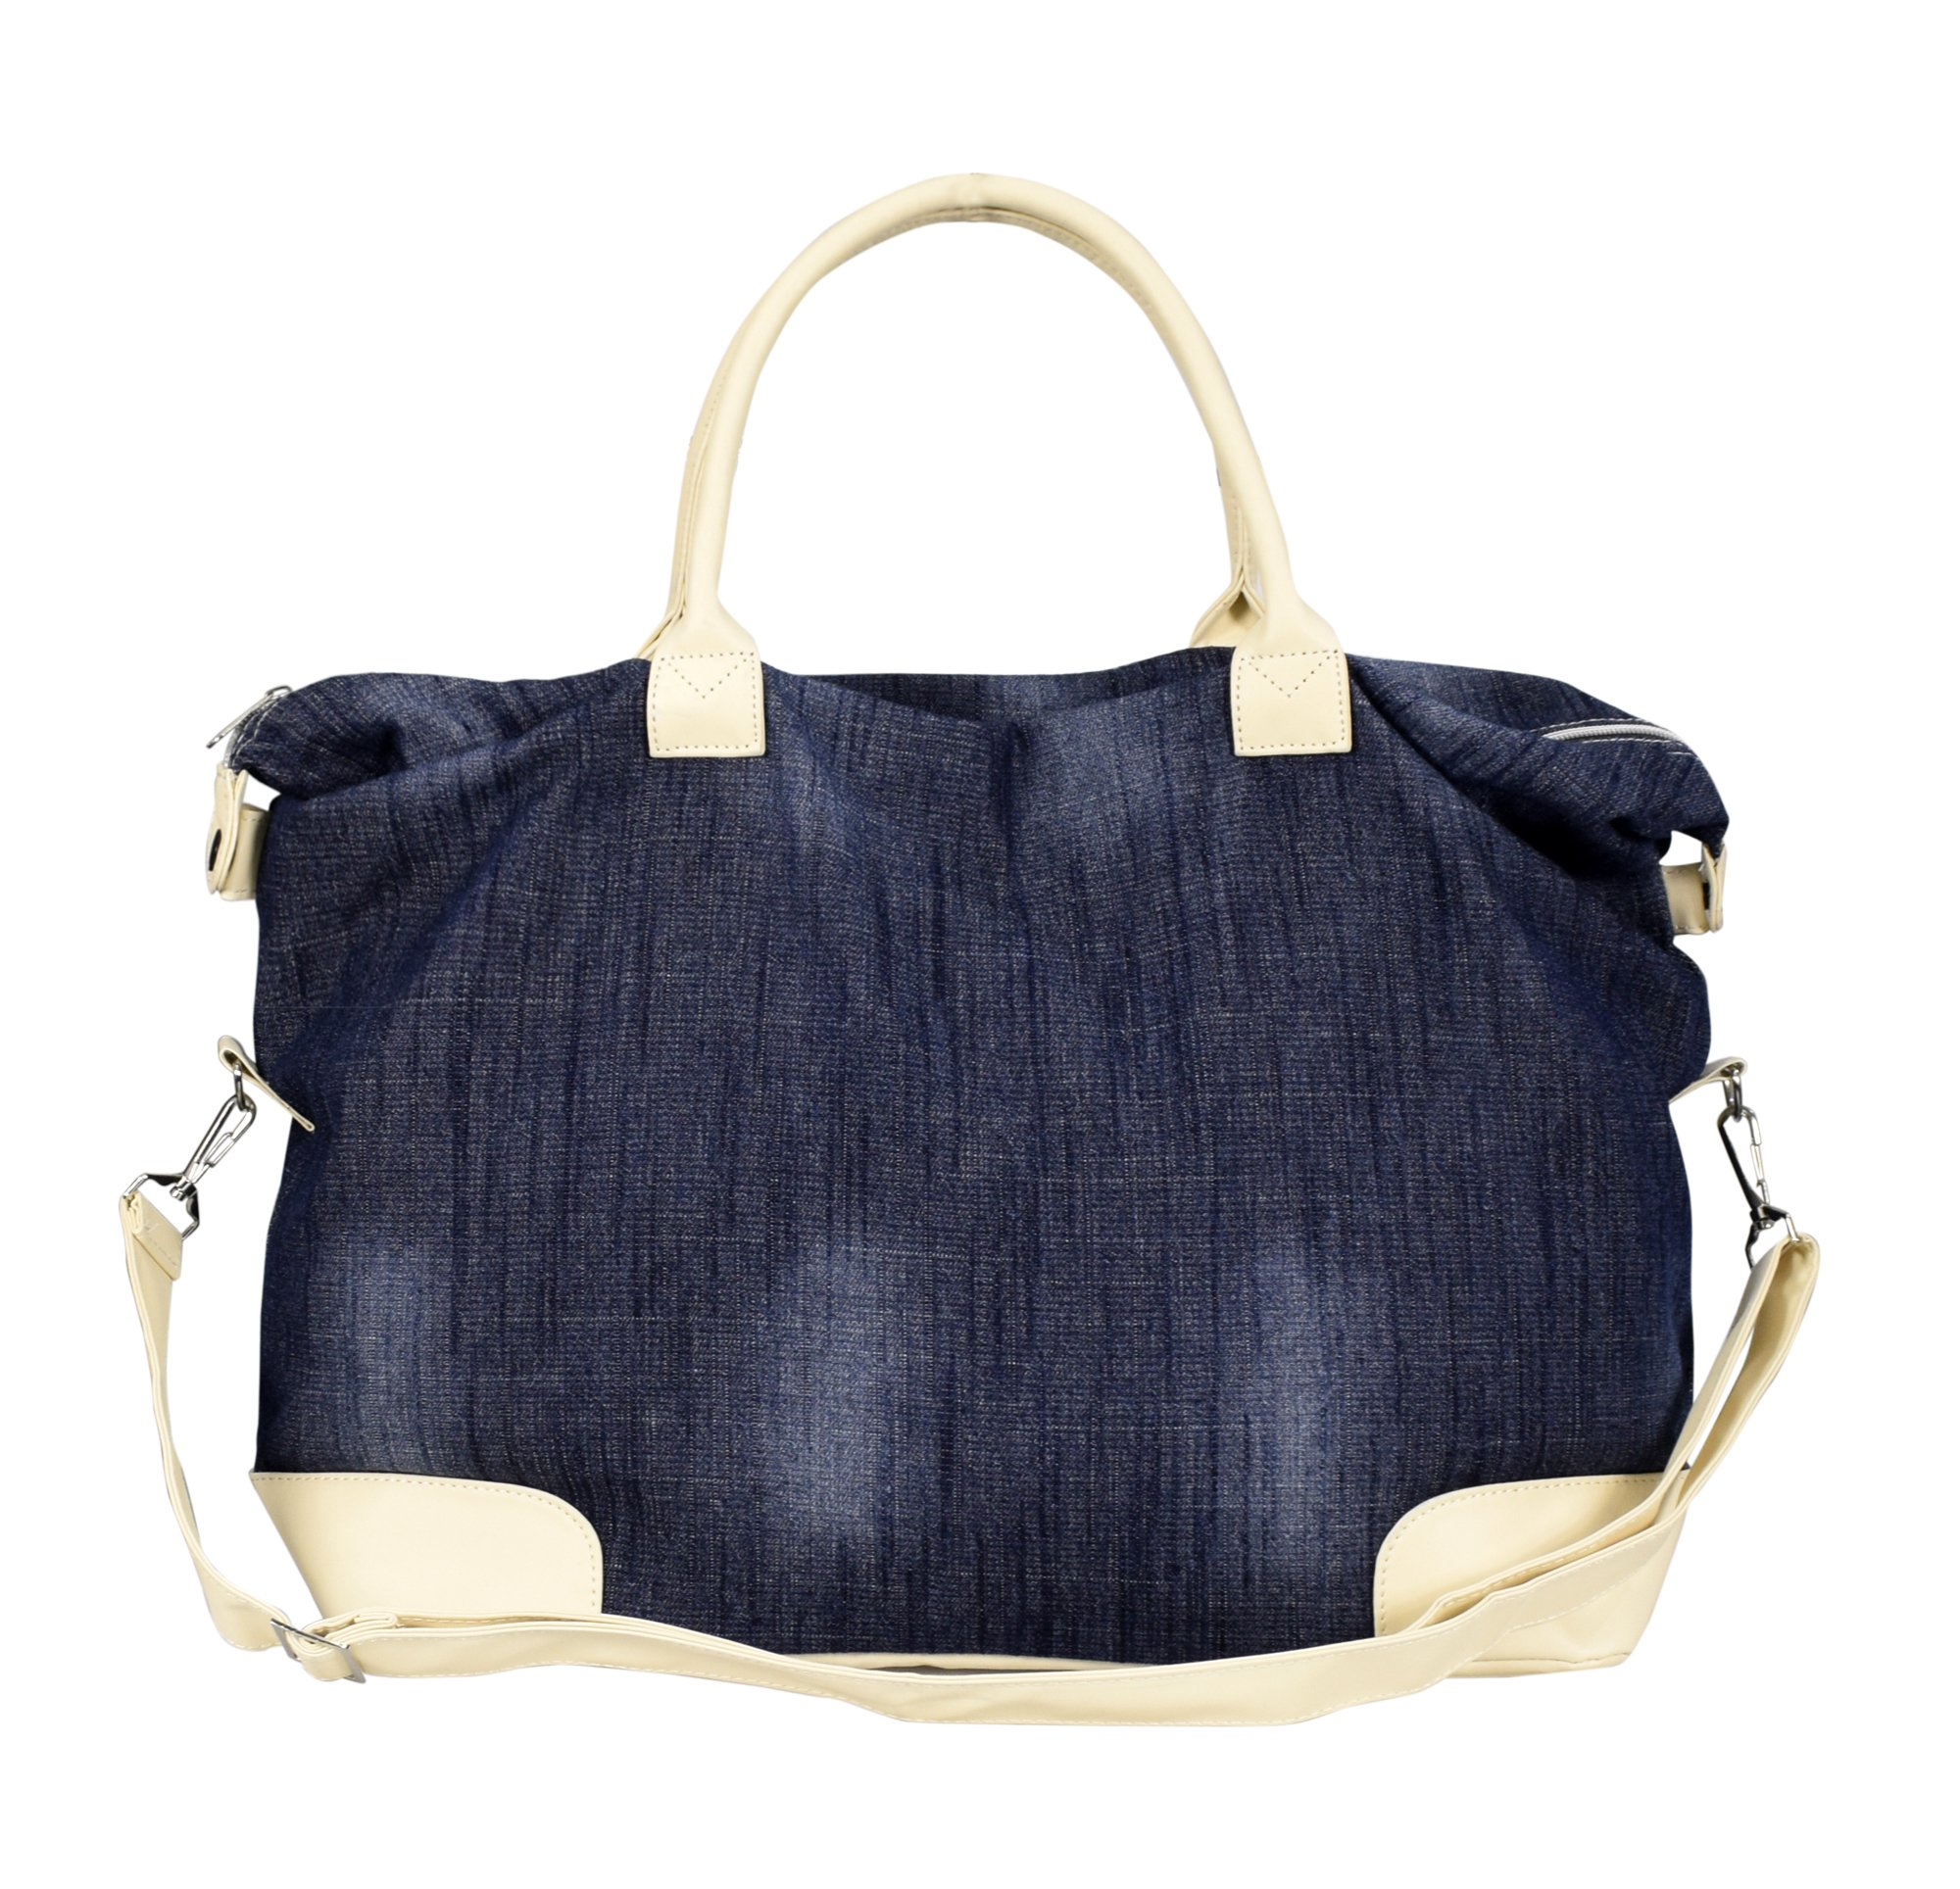 d099e1d58e Peach Couture Denim Jeans Handbags Hobos Large Travel Tote Bags ...